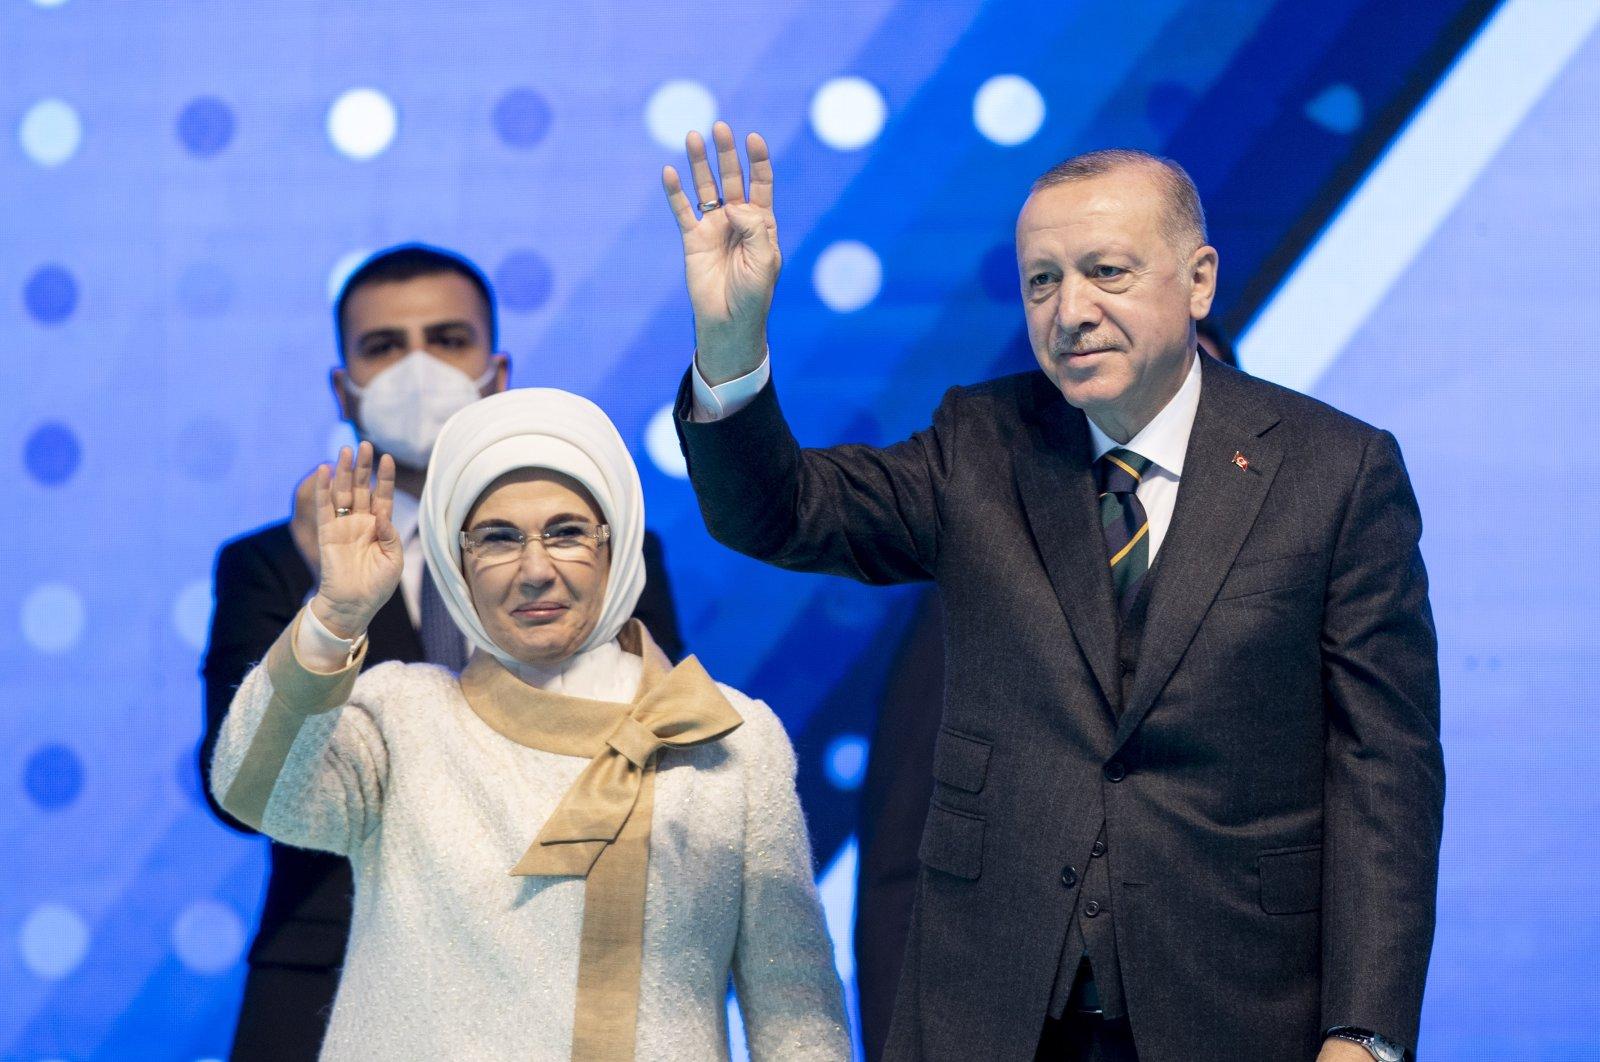 President Recep Tayyip Erdoğan at his party's seventh ordinary congress in the capital Ankara, Turkey, March 24, 2021. (AA Photo)